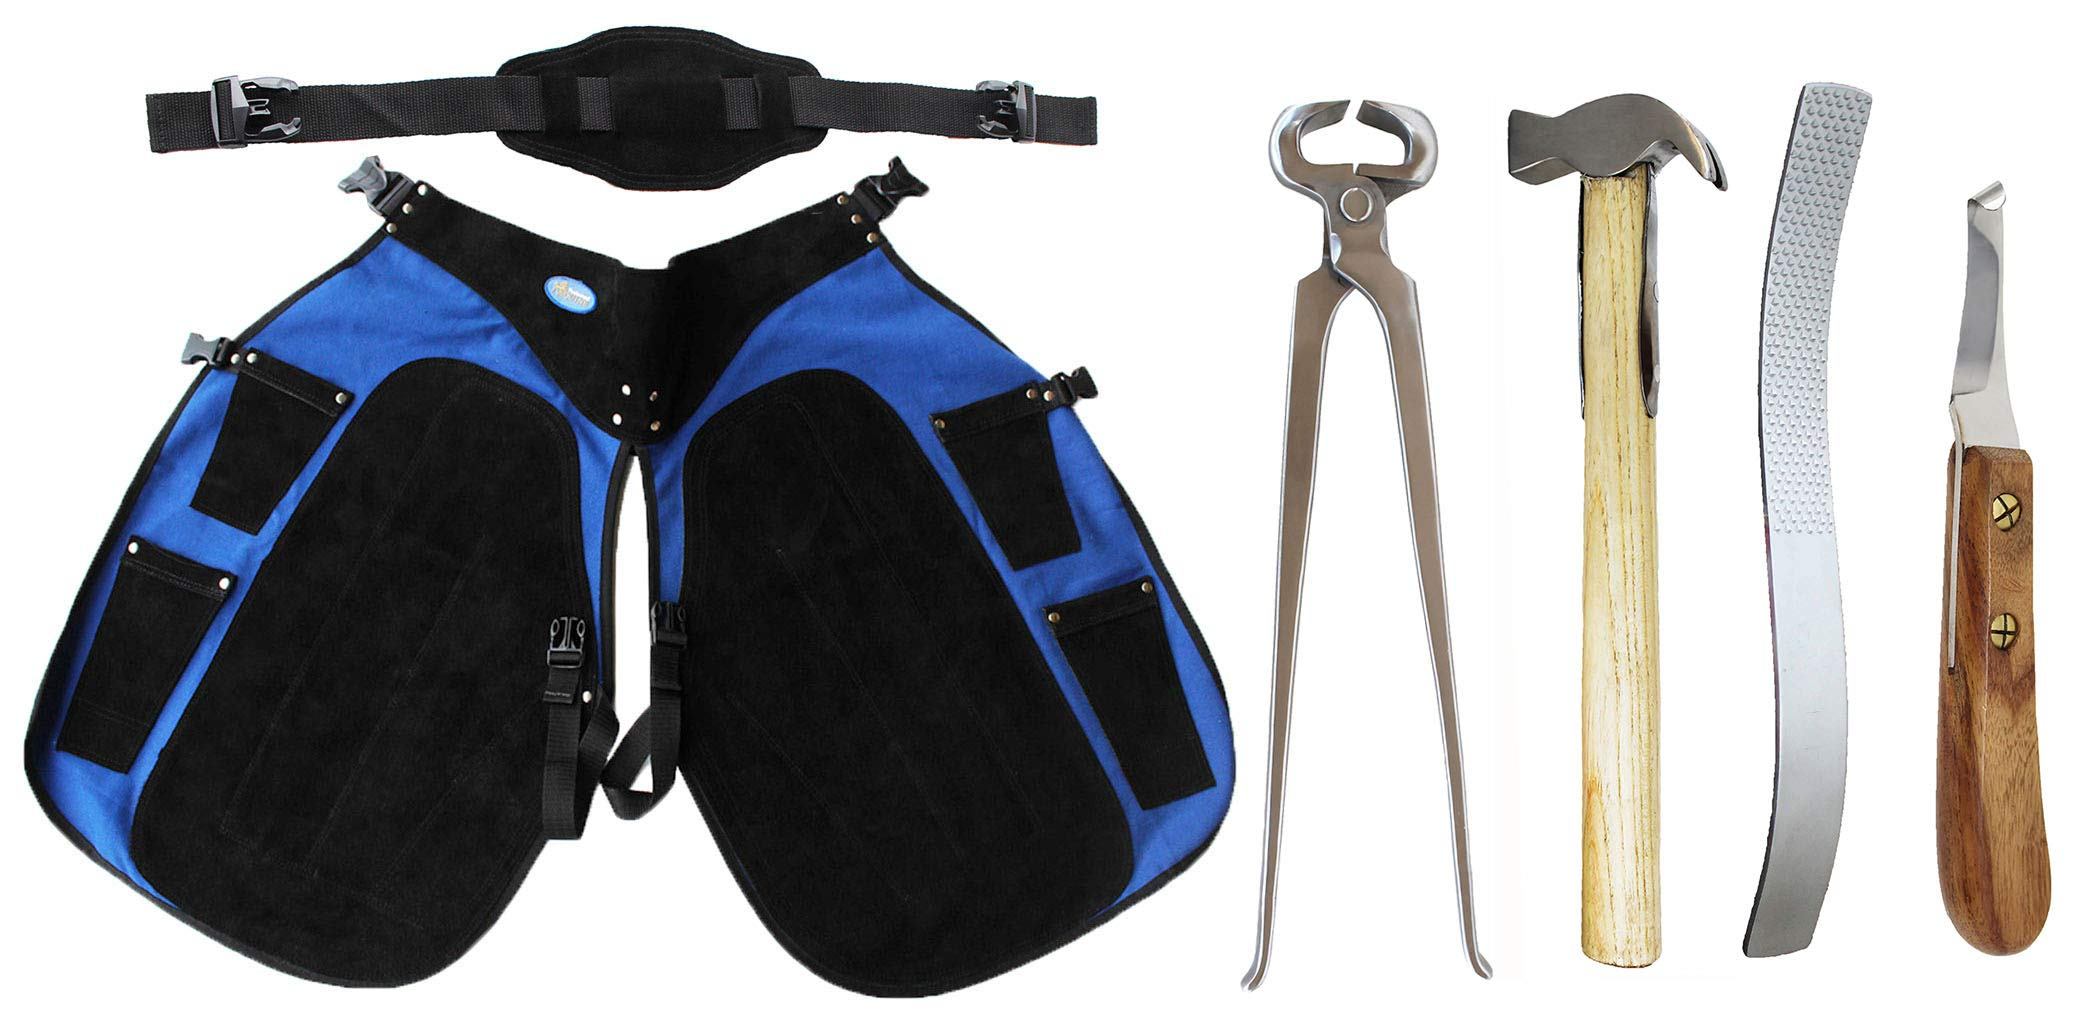 CHALLENGER Horse Farrier Tool 5-Piece Hoof Care Kit w/Apron 984K08